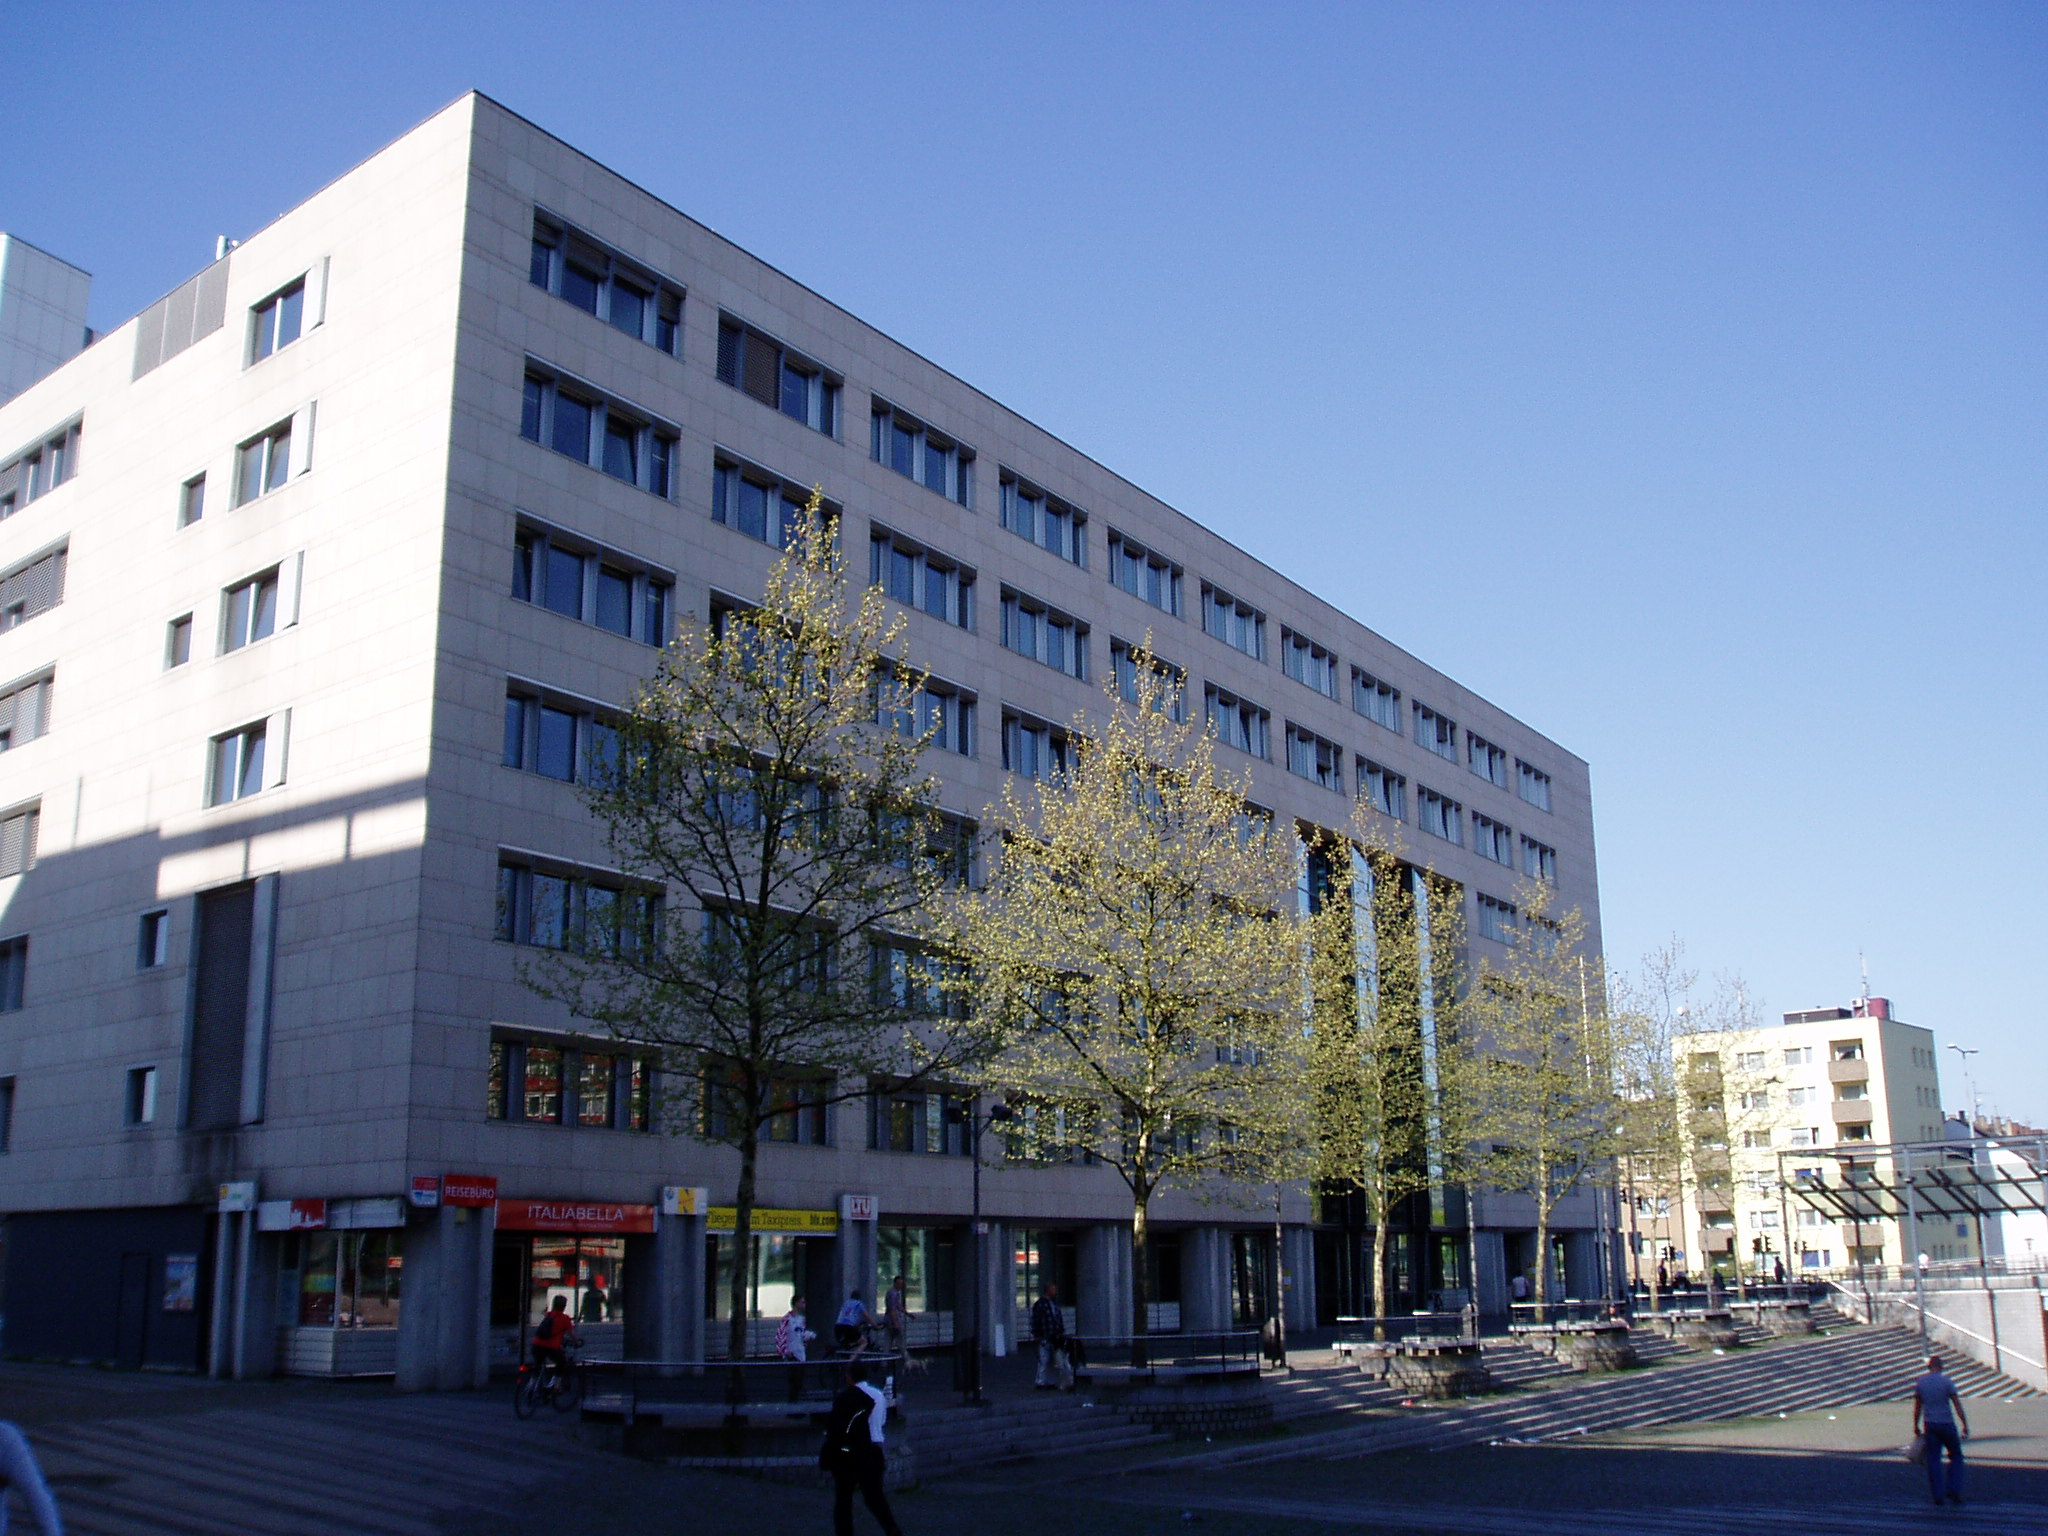 Bezirksrathaus Mülheim